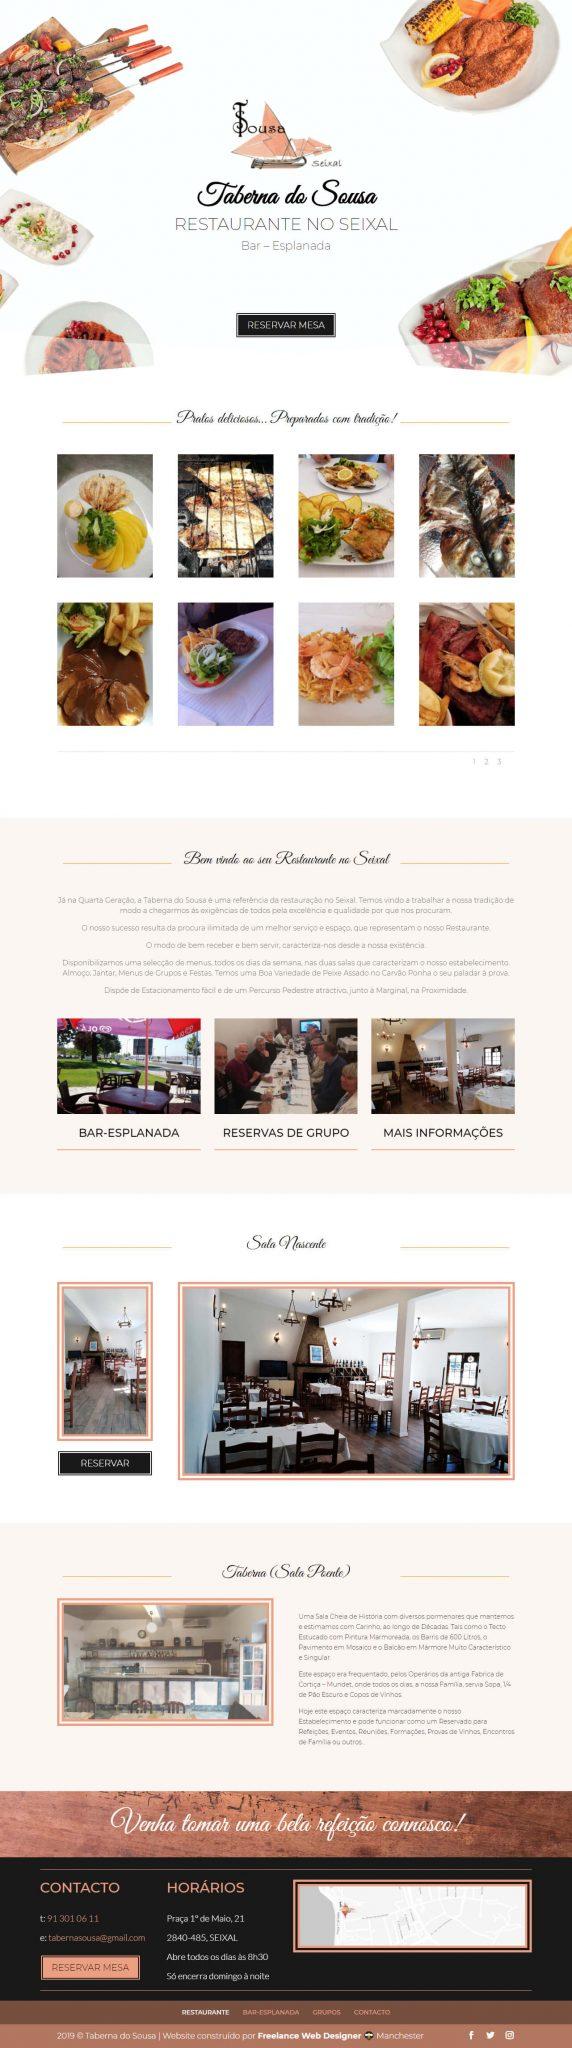 manchester web design agency